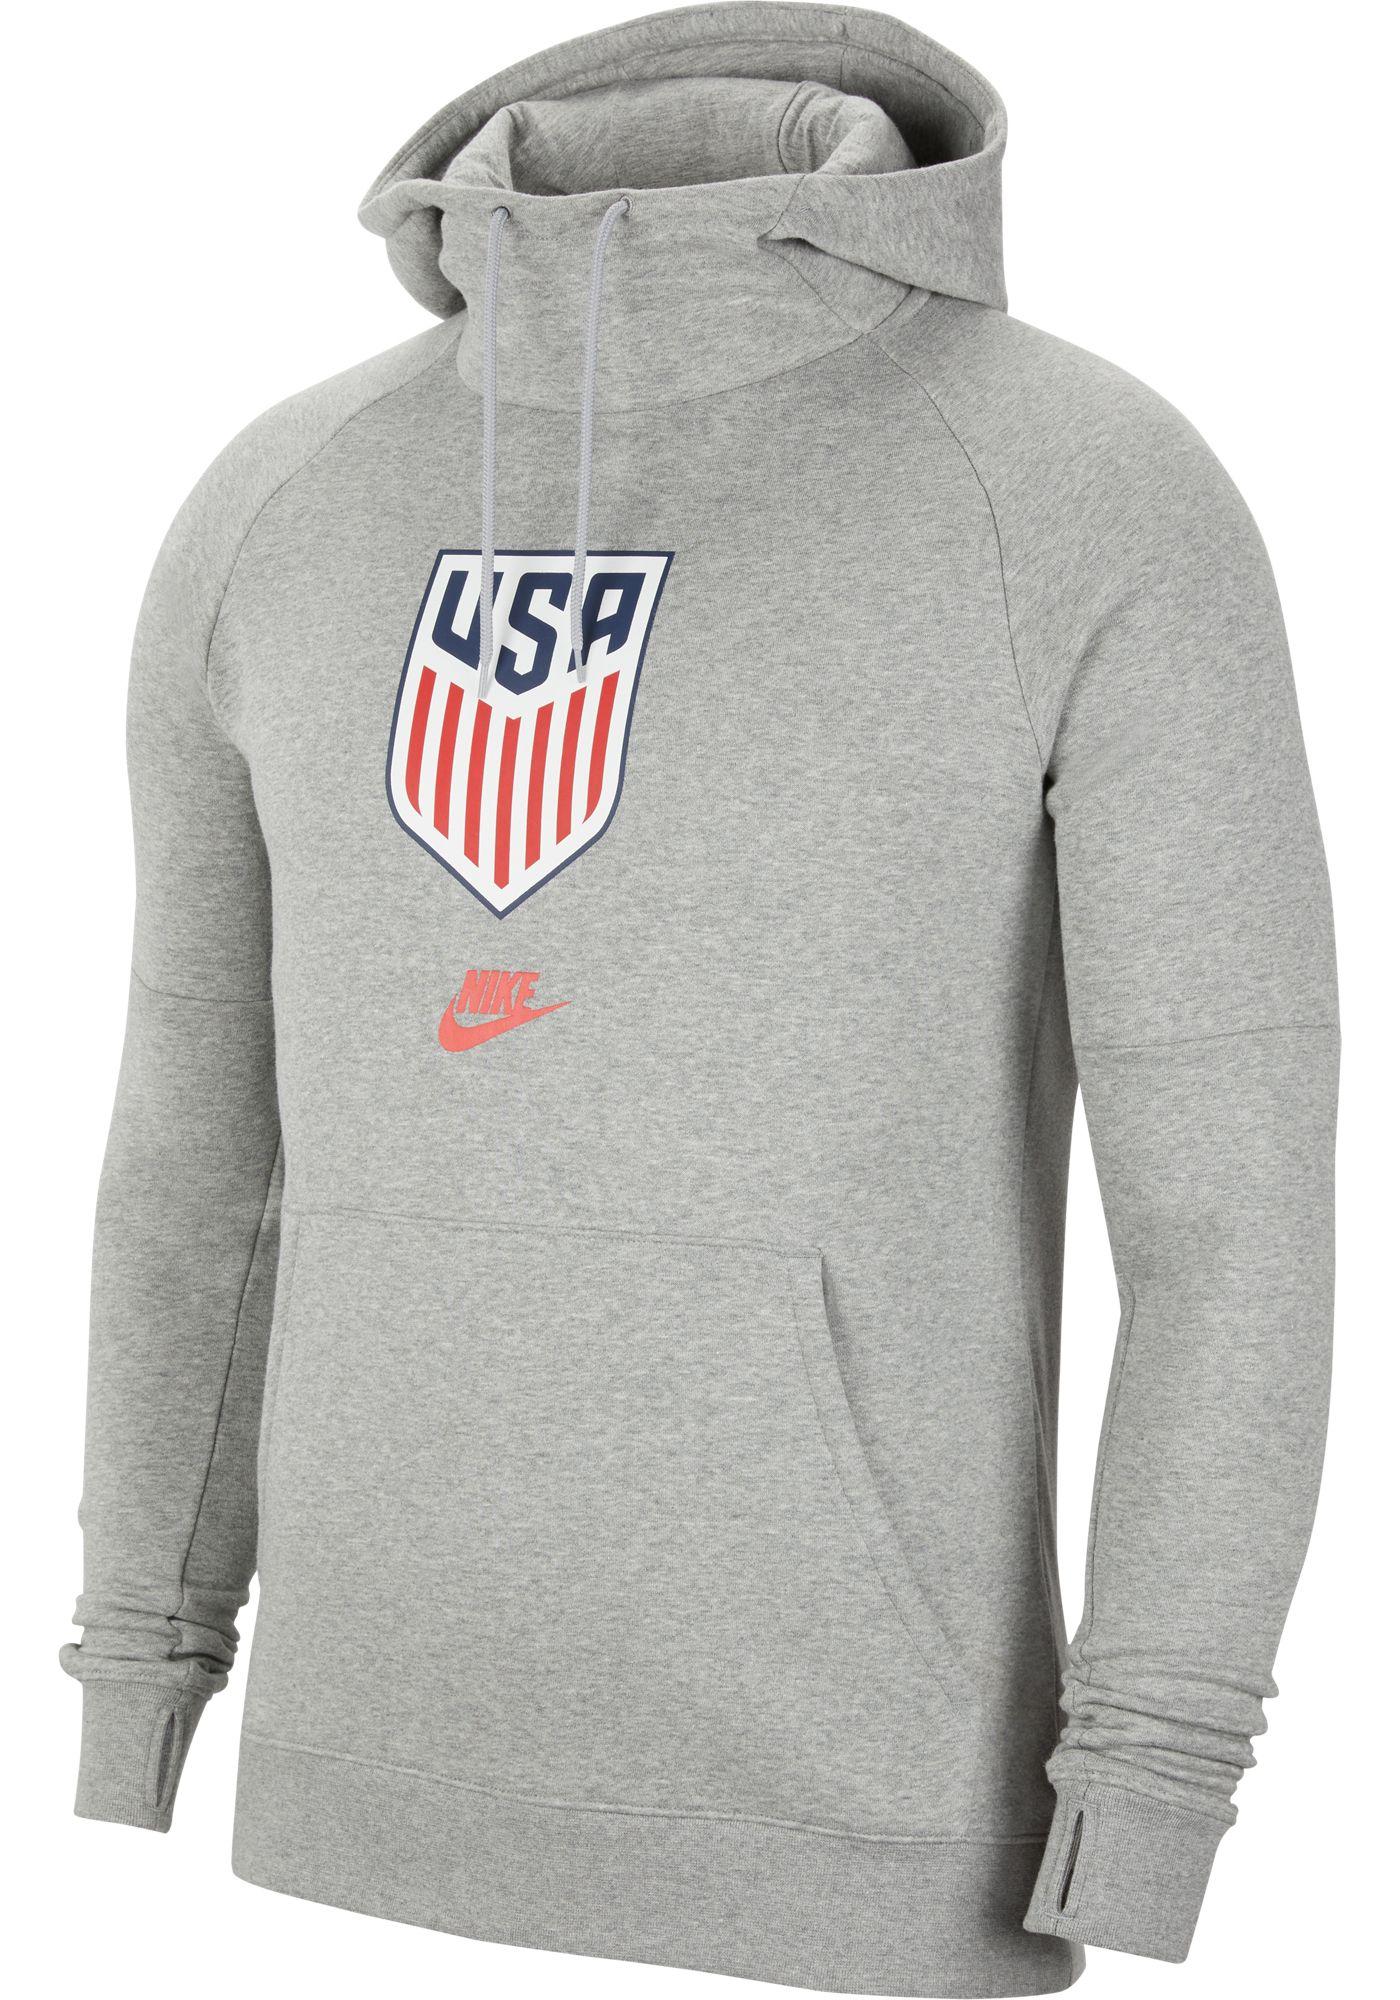 Nike Men's USA Soccer Team Heather Grey Pullover Hoodie